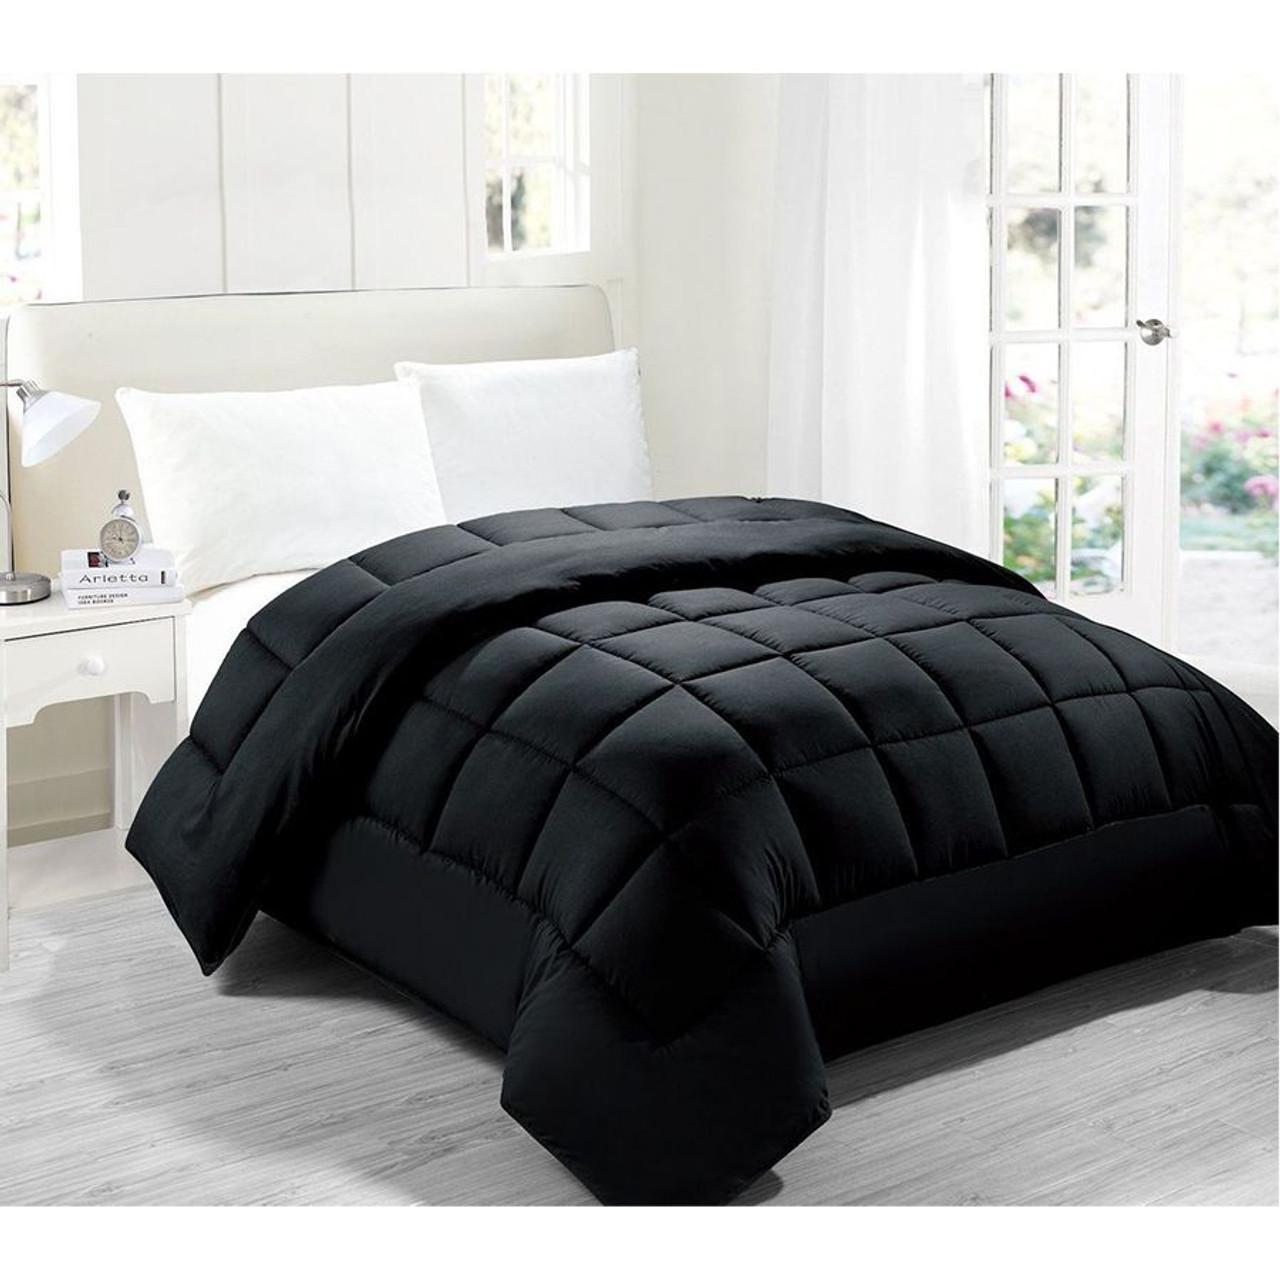 Down Alternative Comforter Hypoallergenic anti-dustmite anti-bacterial Black Color